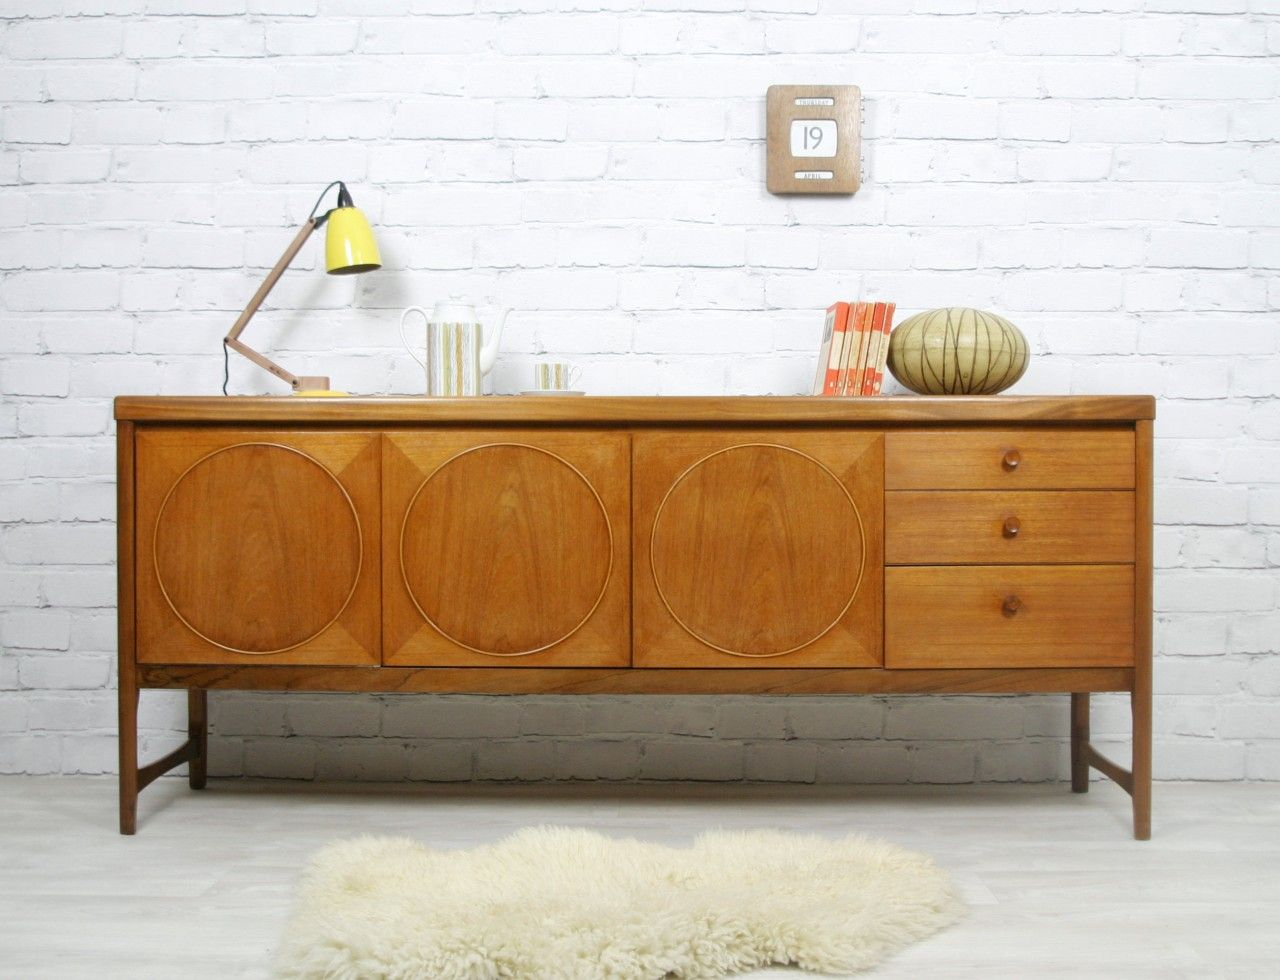 teak retro furniture. Vintage Teak Sideboard Manufactured By Nathan. Retro Furniture N